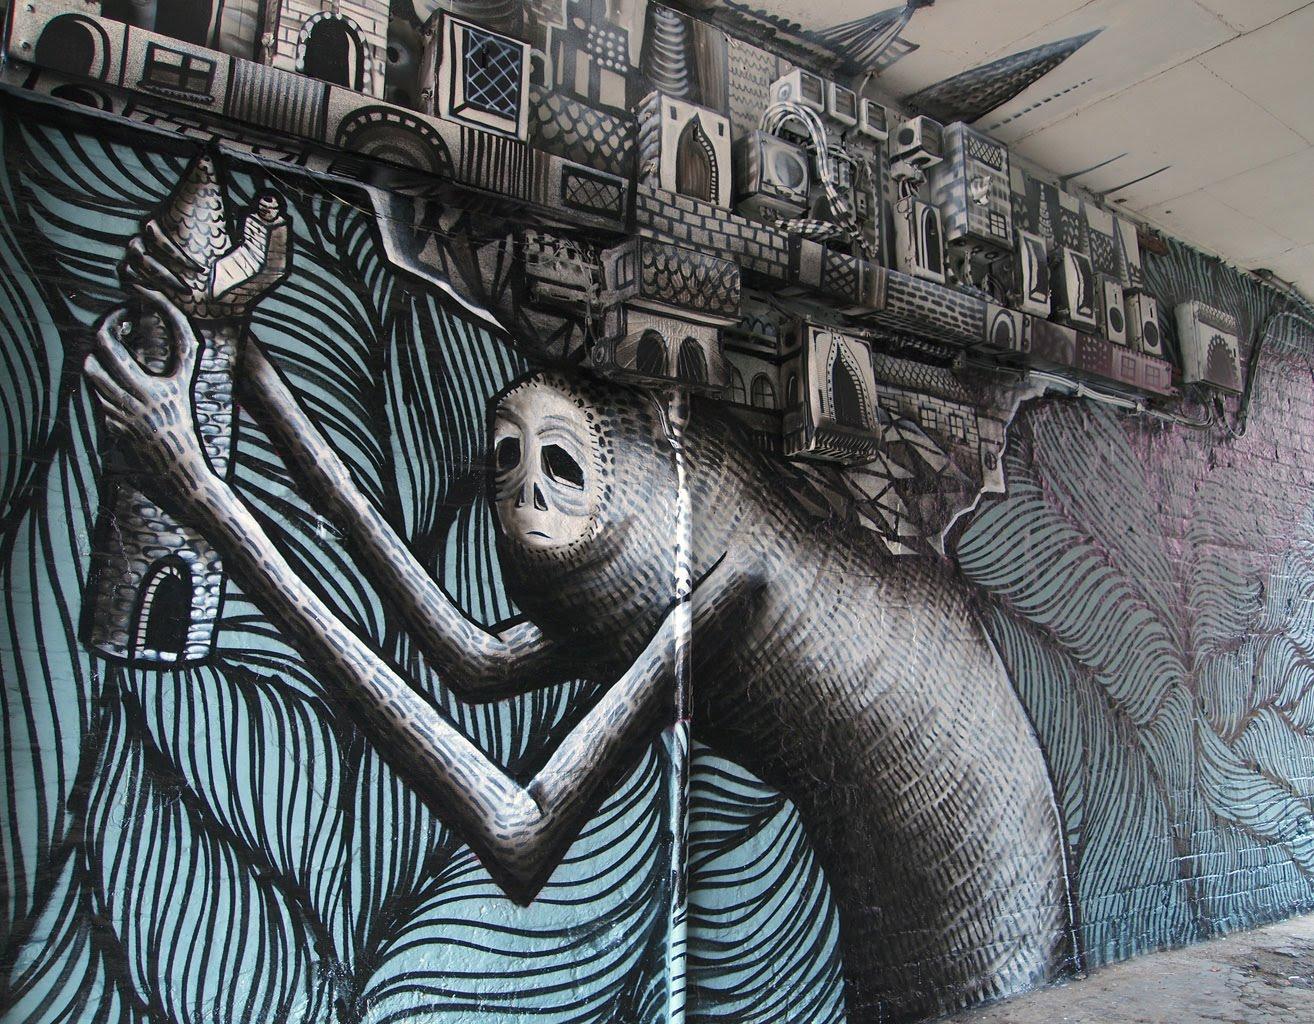 Kid Acne X Phlegm Sheffield Street Art Hookedblog Street Art From London And Beyond